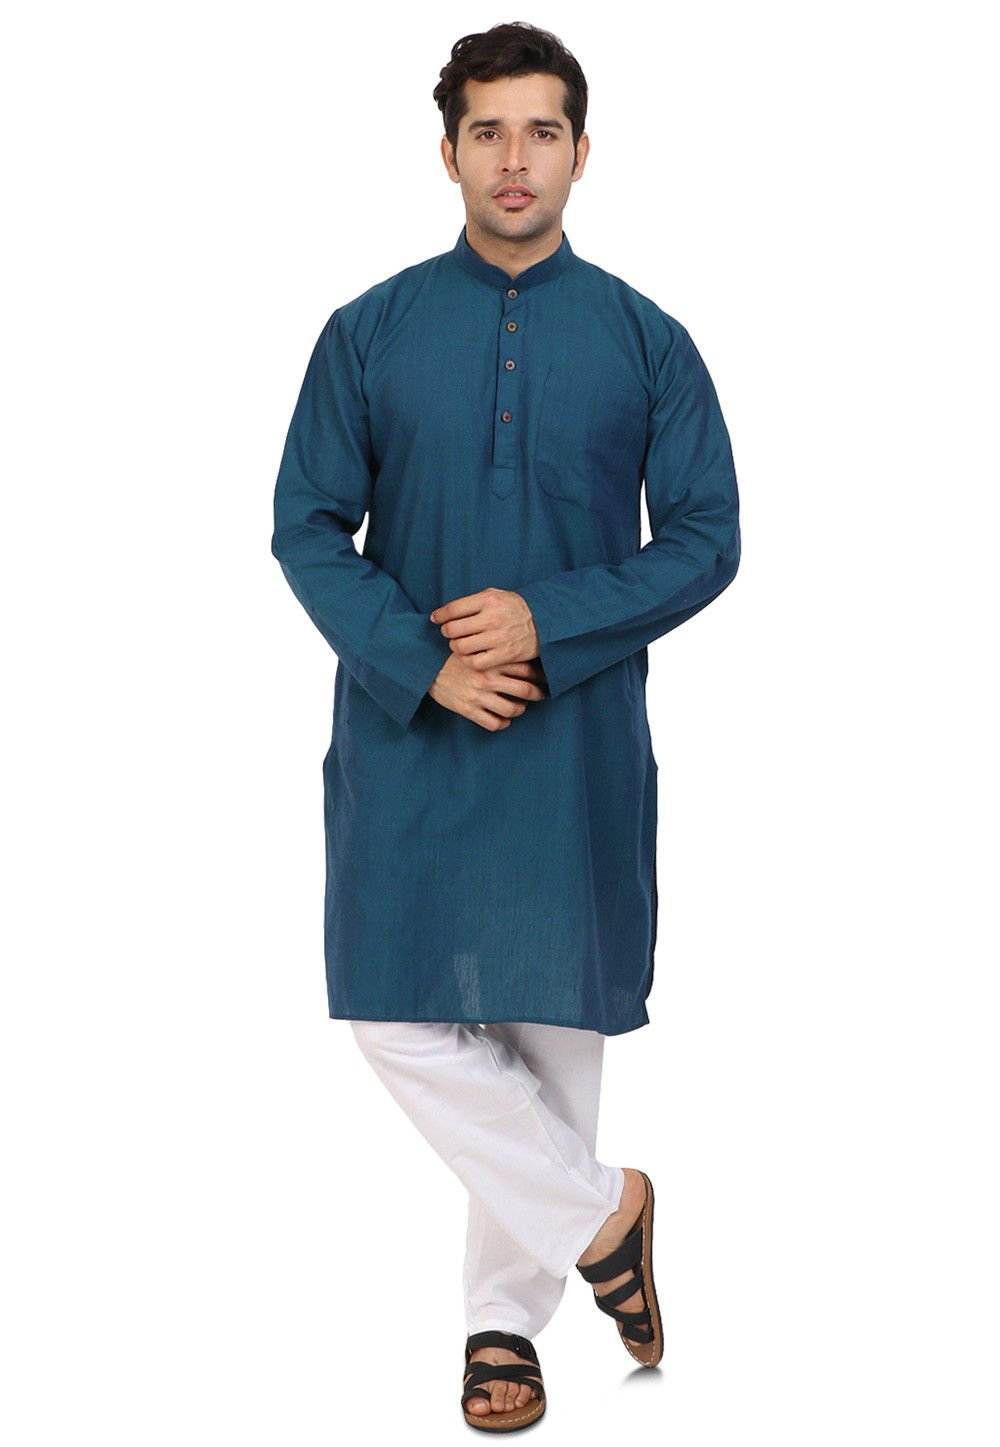 Cellora Men's Classic Kurta Pajama Ethnic Style Wedding Party Wear Cotton Kurta Pyjama